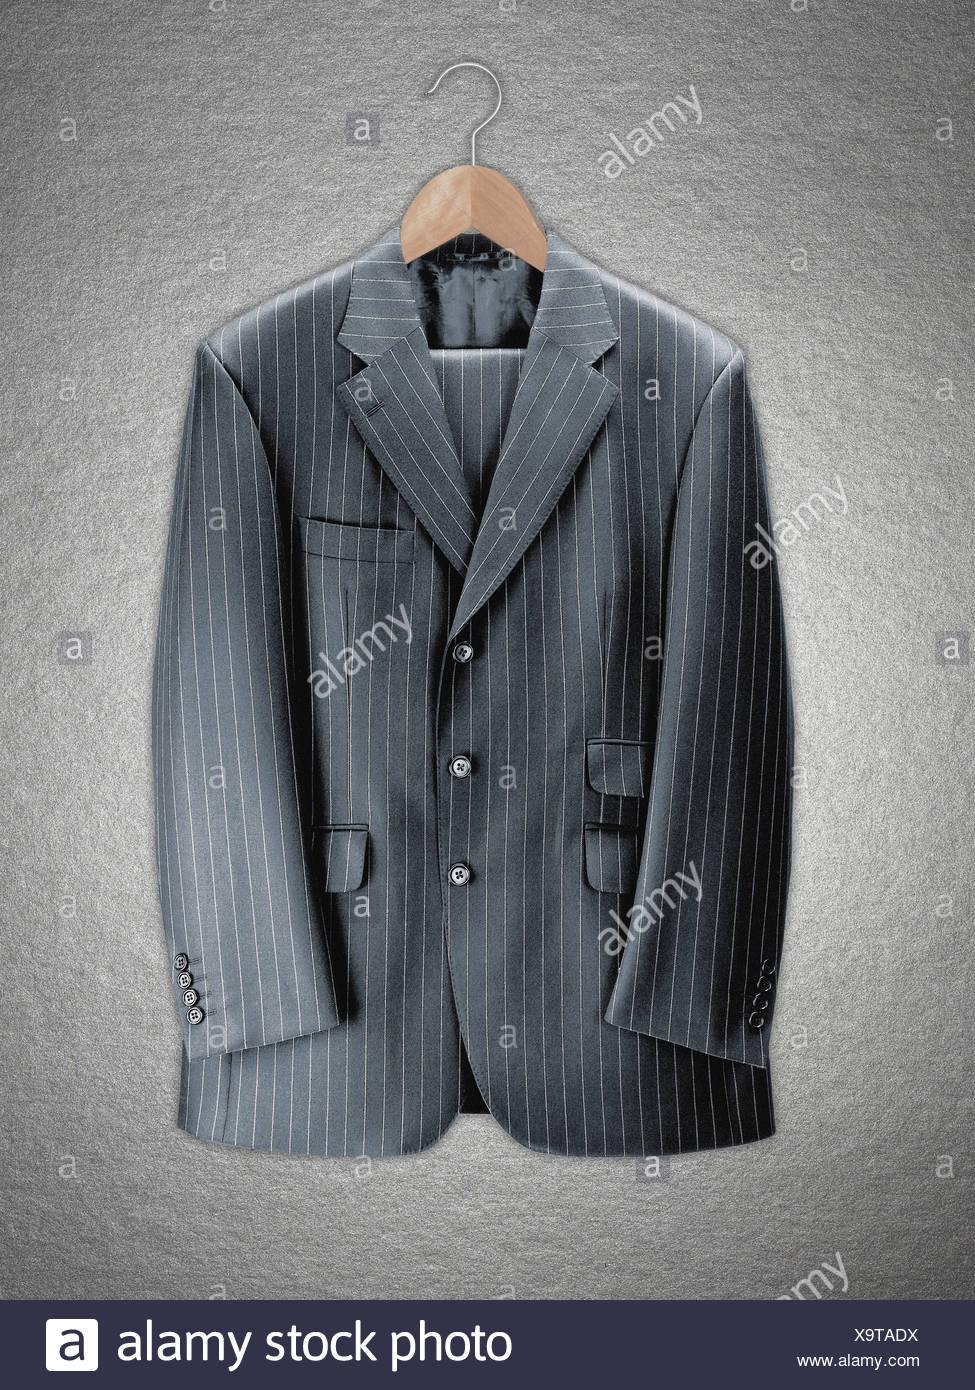 Business-Anzug auf Kleiderbügel Stockbild